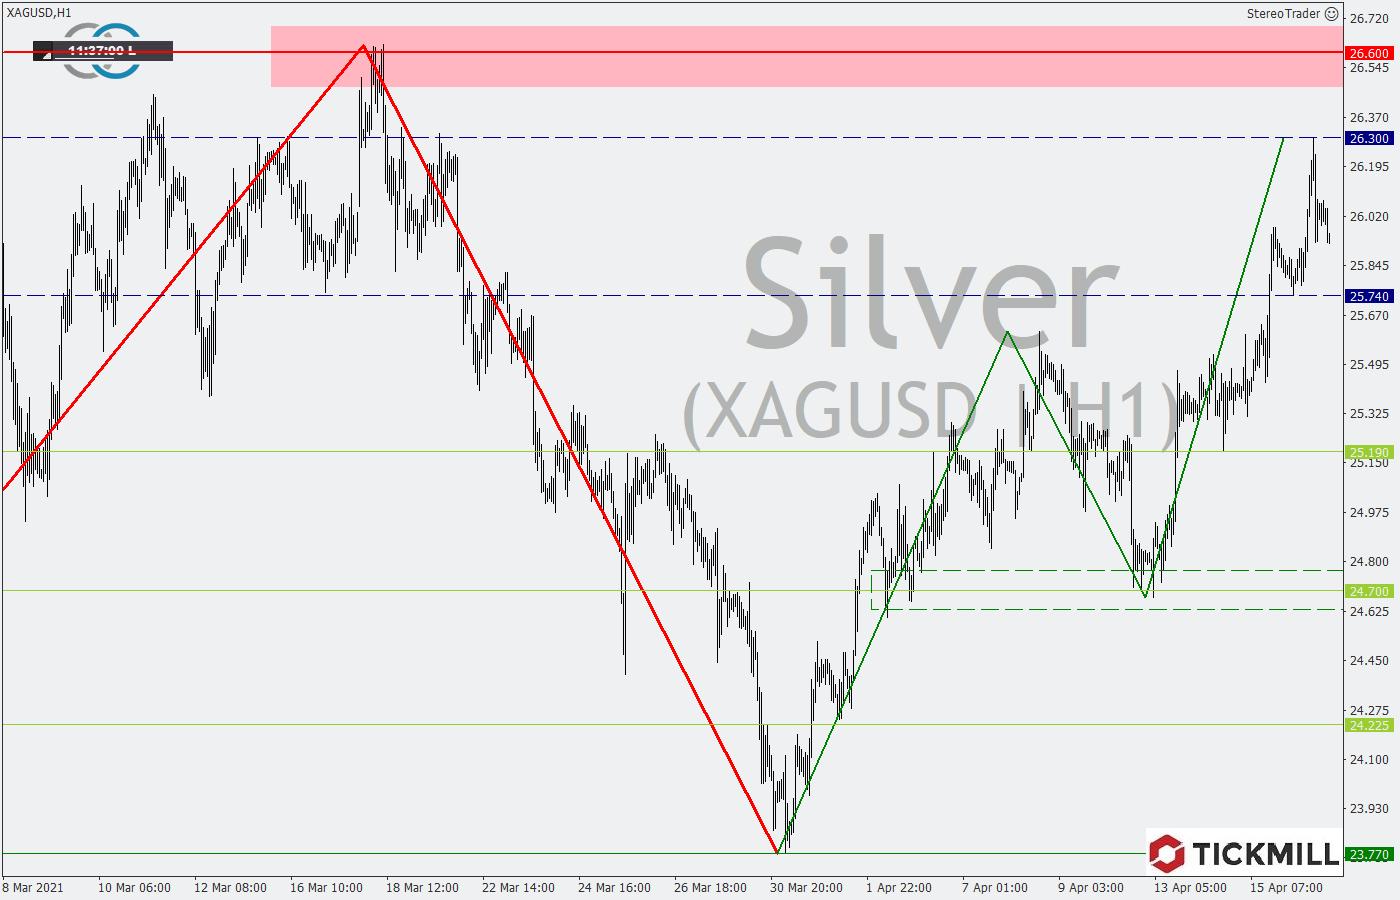 Tickmill-Analyse: Silber im Stundenchart